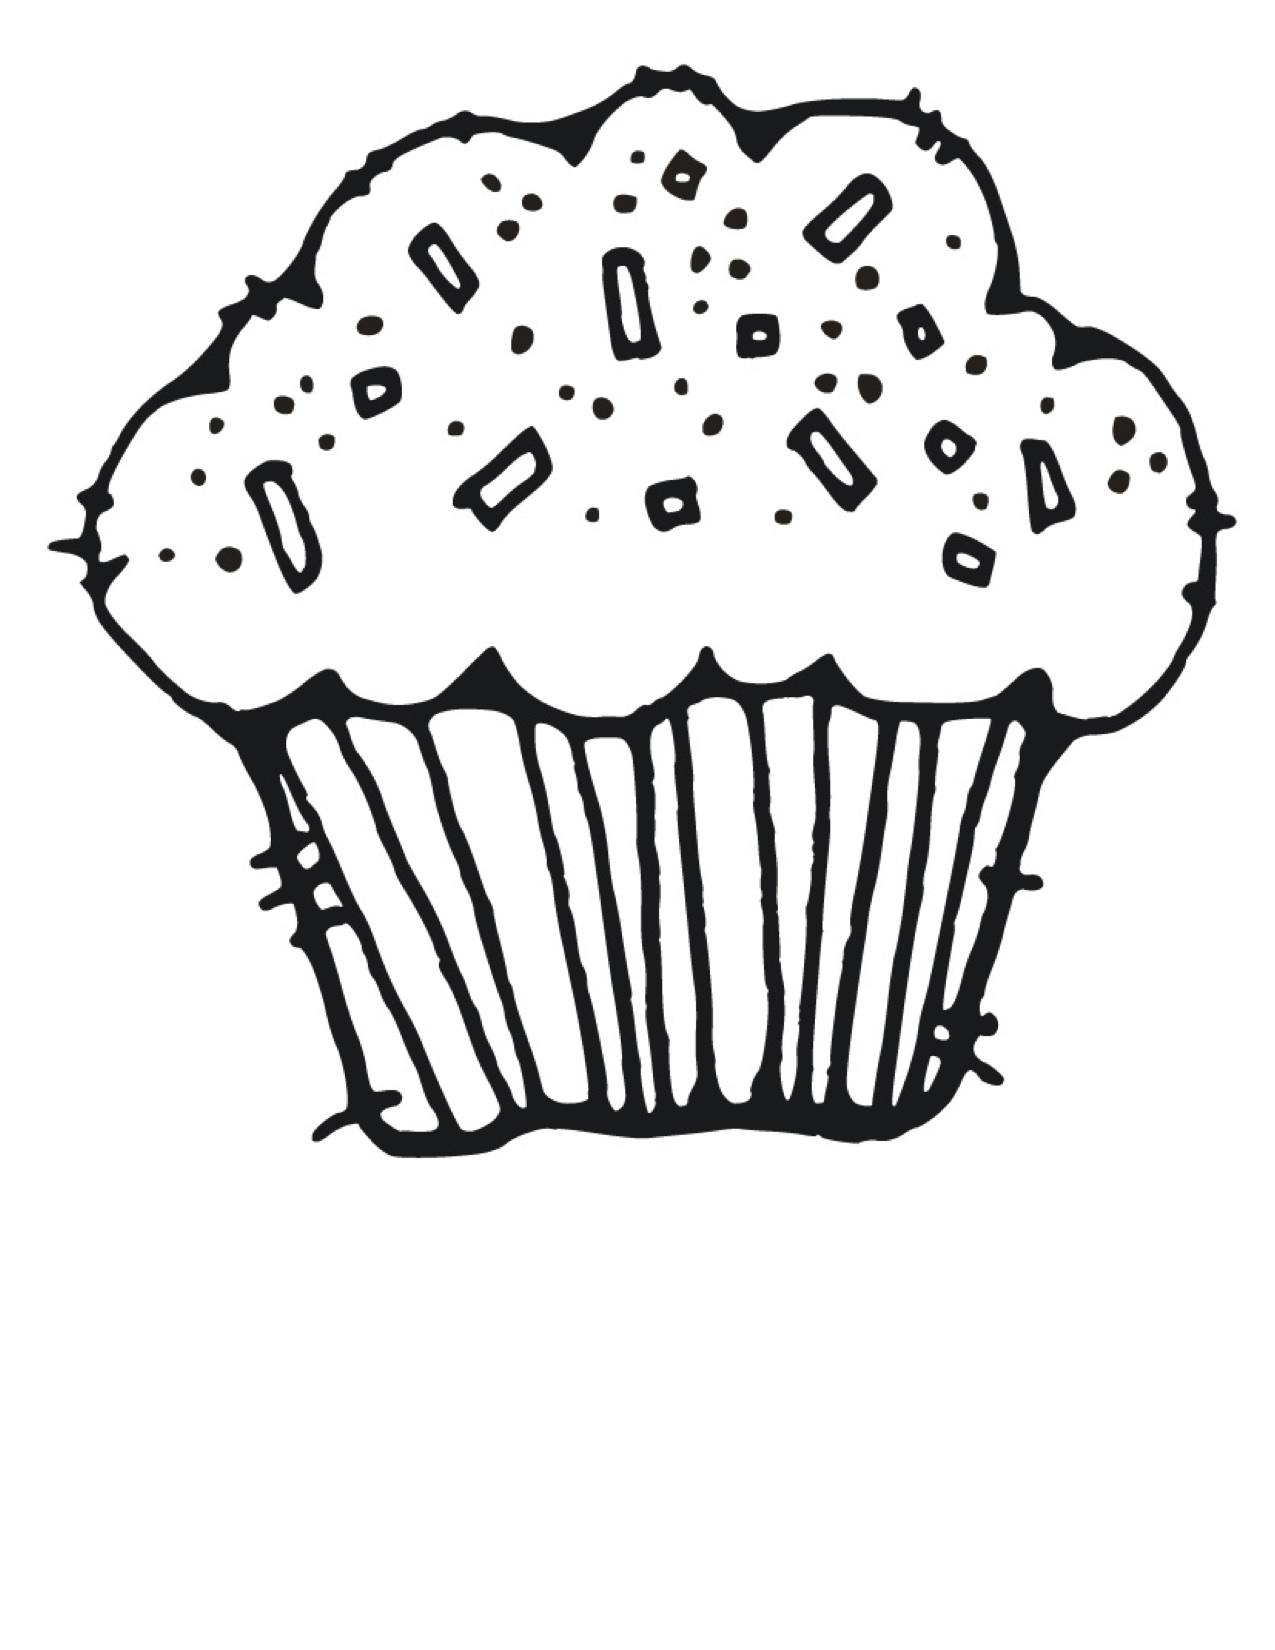 Cute Clipart Cupcakes Black A - Cupcake Clipart Black And White